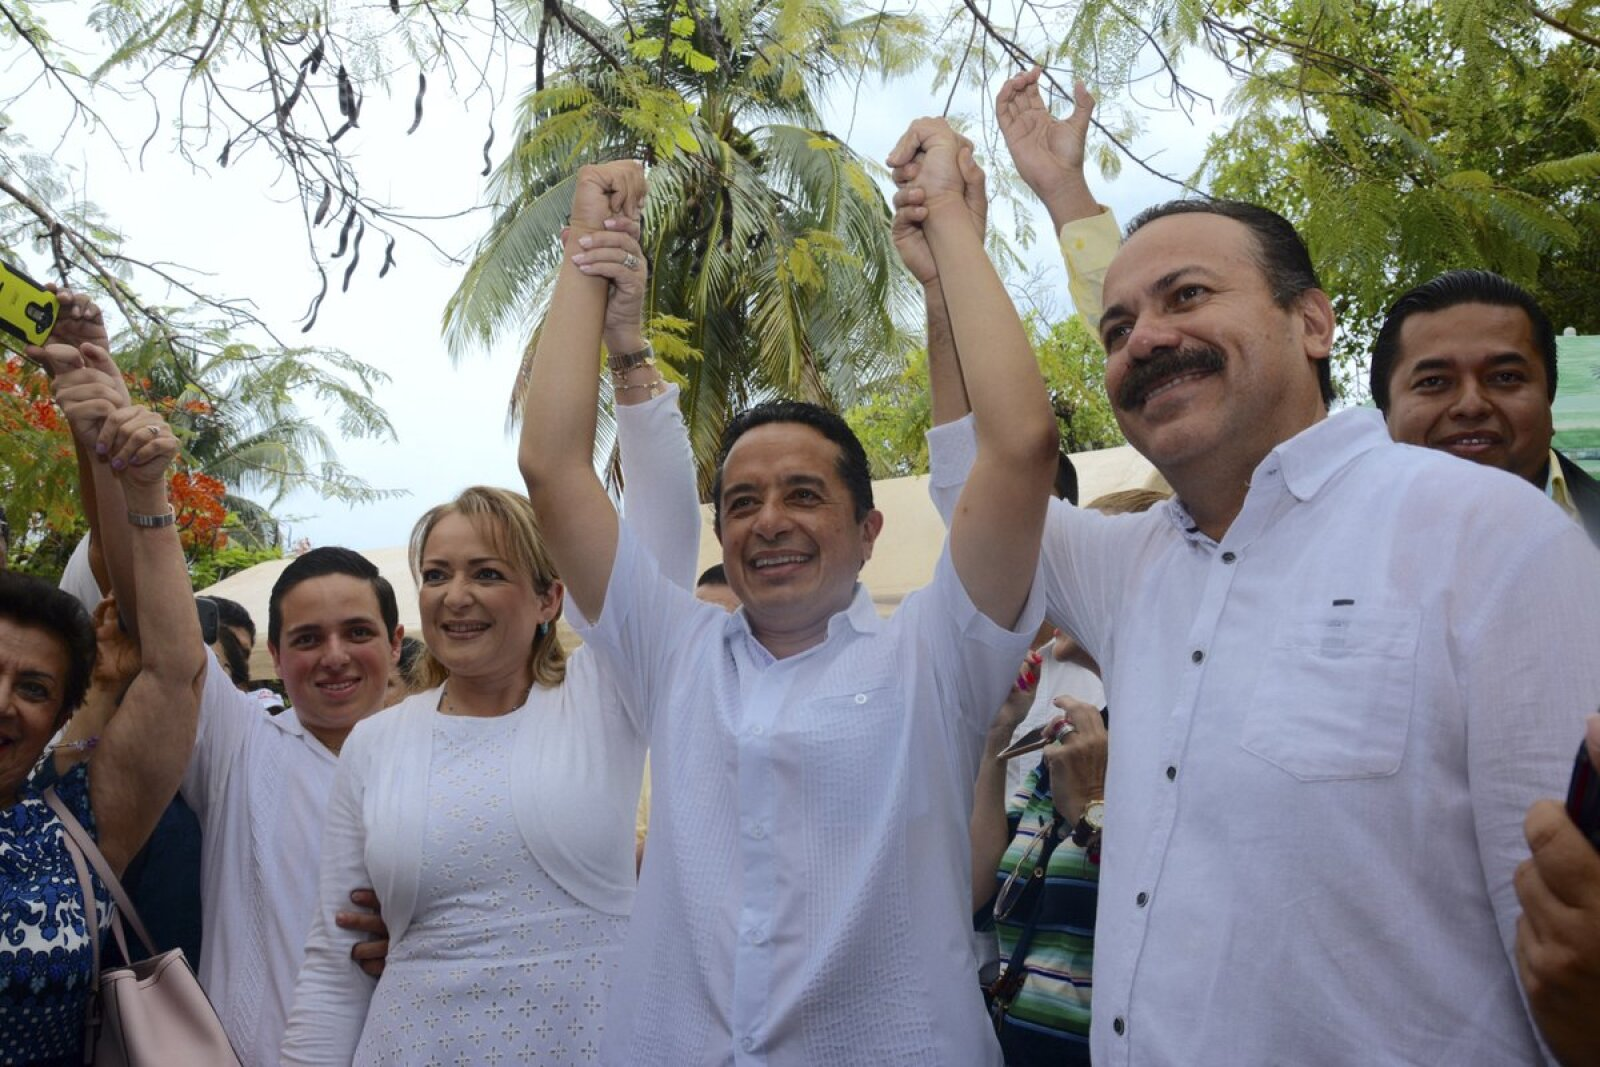 Carlos Joaquín, candidato de la alianza PAN-PRD a gobernador de Quintana Roo, @CarlosJoaquin, emitió su voto en Cancún.